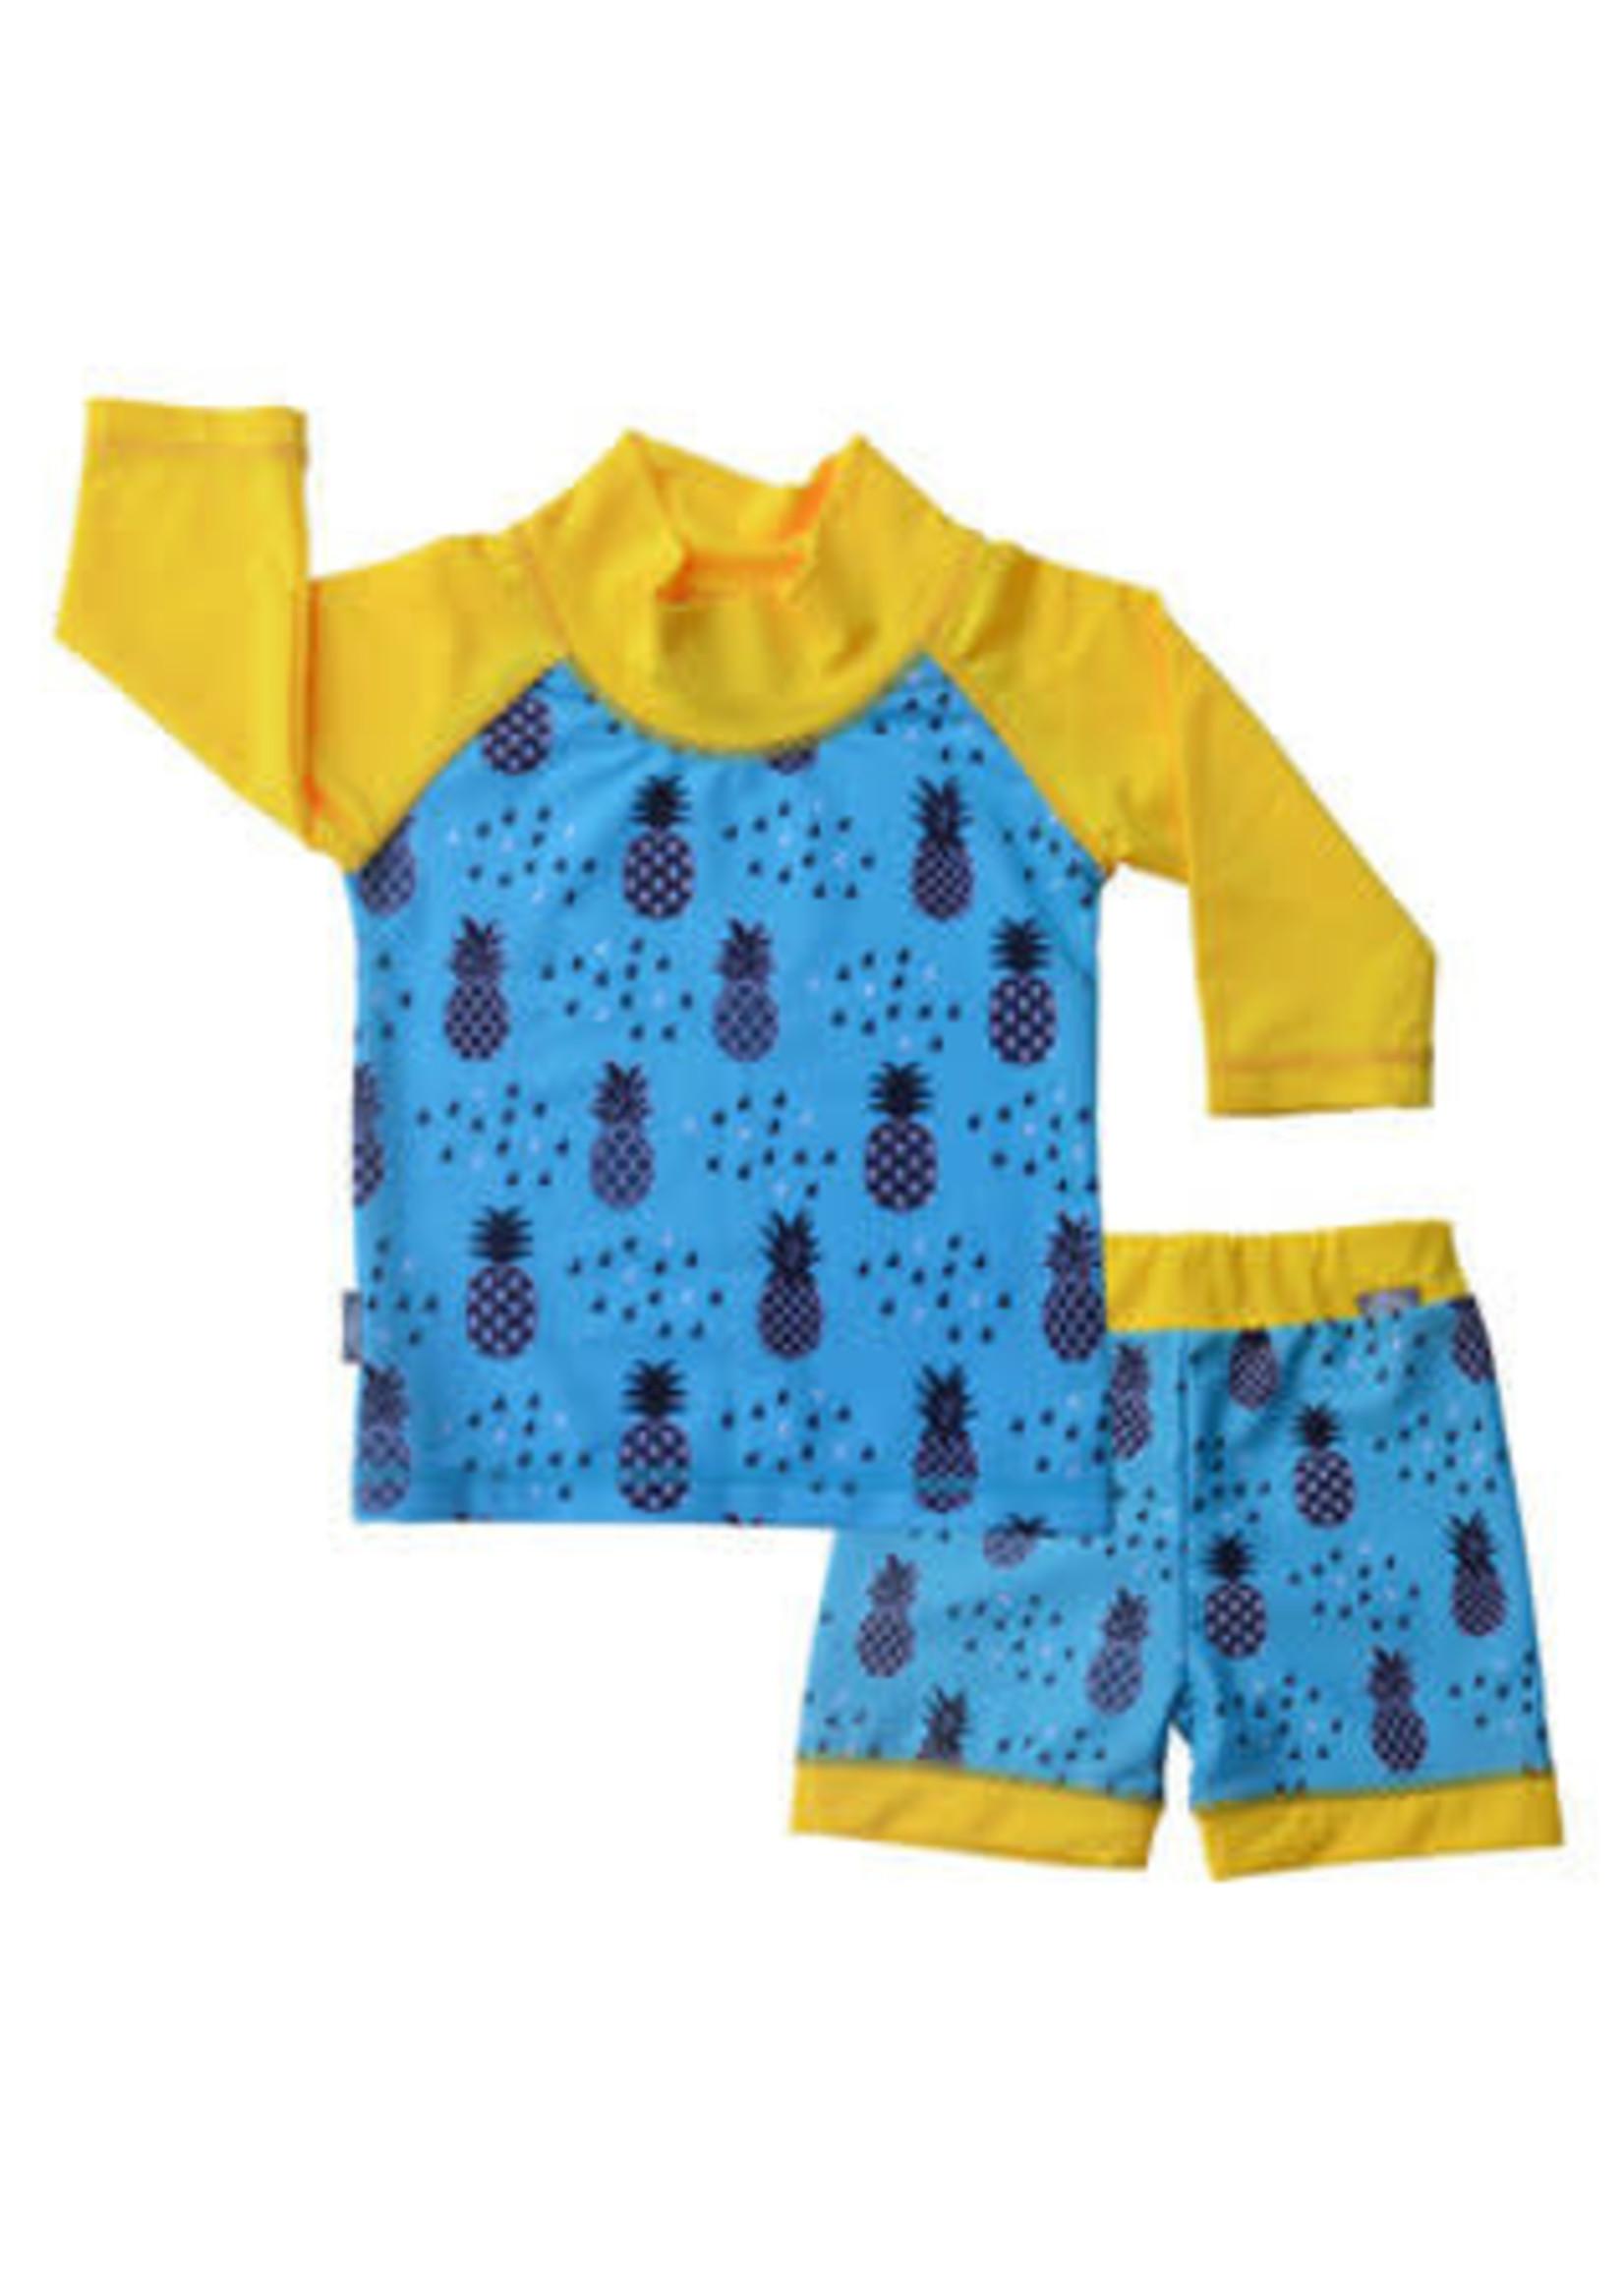 jan & jul Swim Shirt & Short Set (Pineapple)